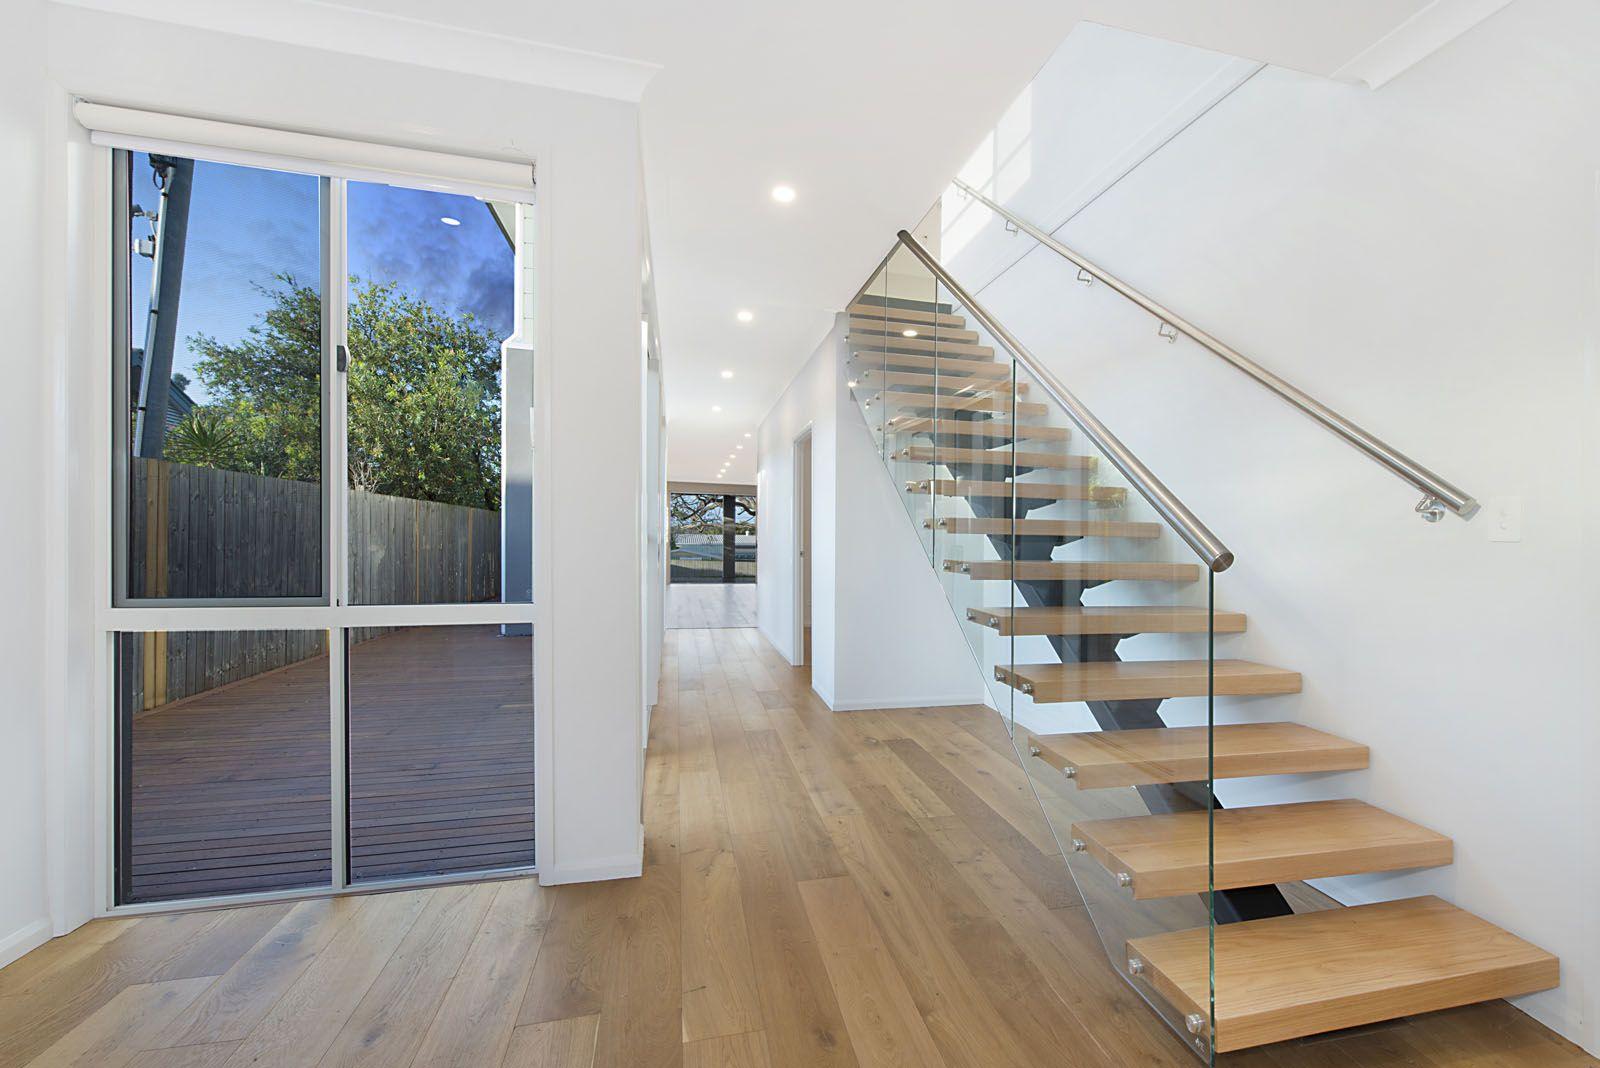 177 Lister St, Sunnybank QLD 4109, Image 1